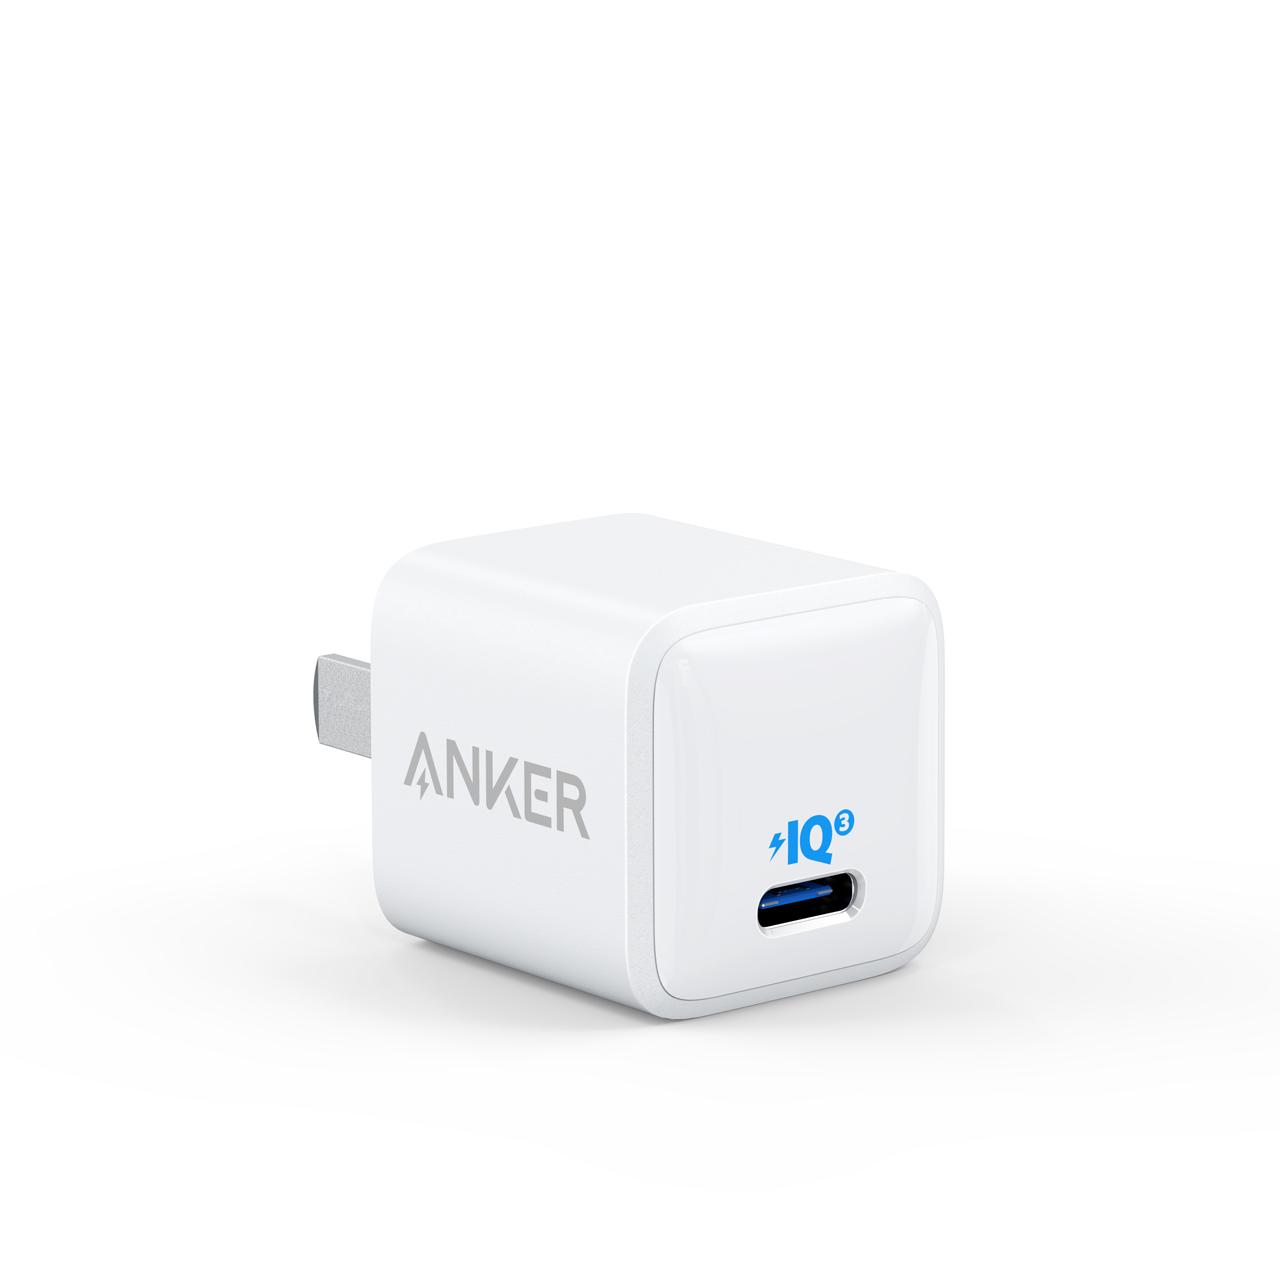 ANKER 安克 A2616 PD 18W快速充电器 (白色)